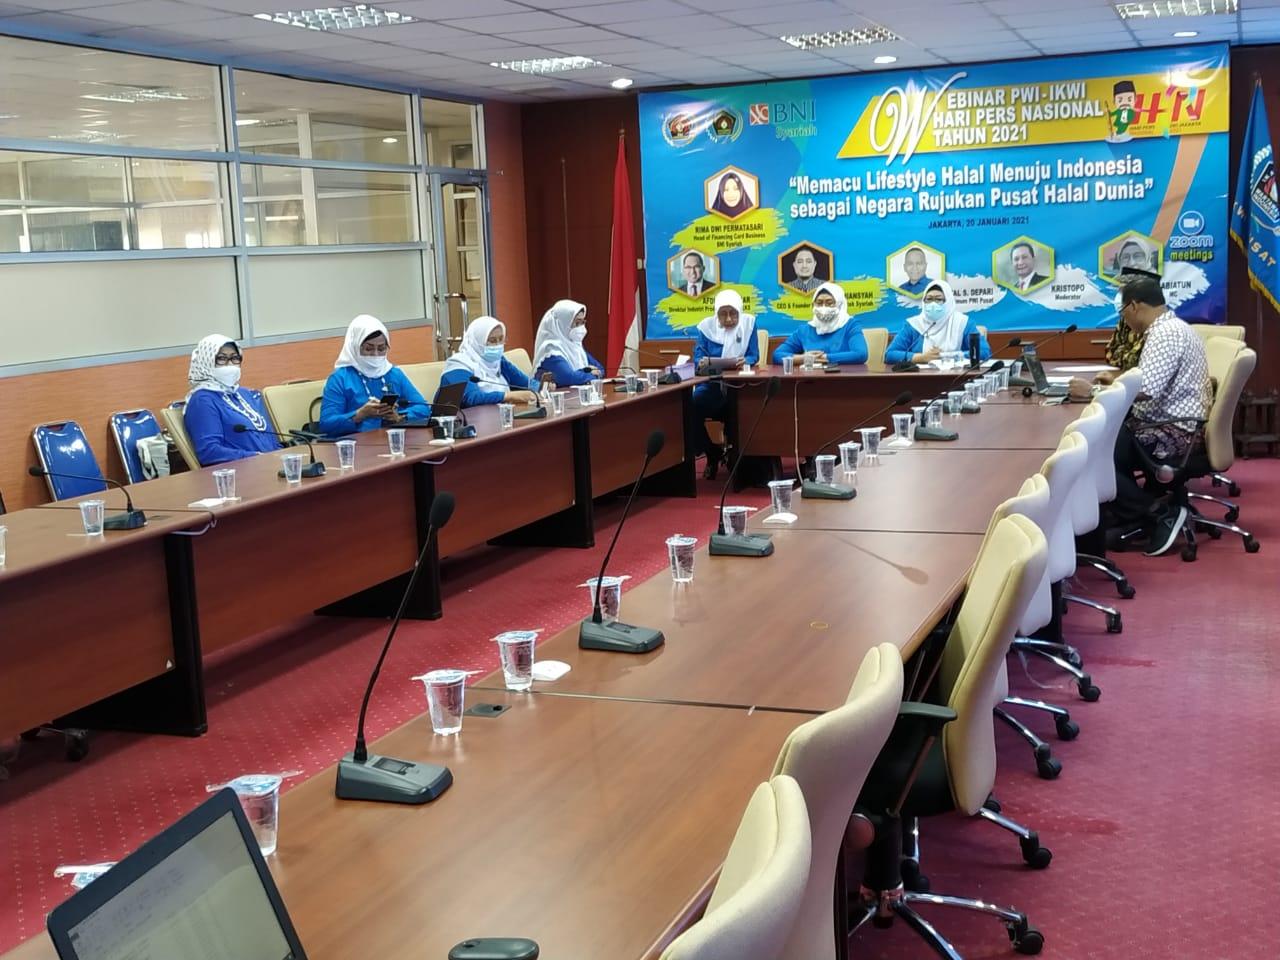 PWI-IKWI Gelar Webinar Menuju Indonesia Sebagai Negara Rujukan Pusat Halal Dunia